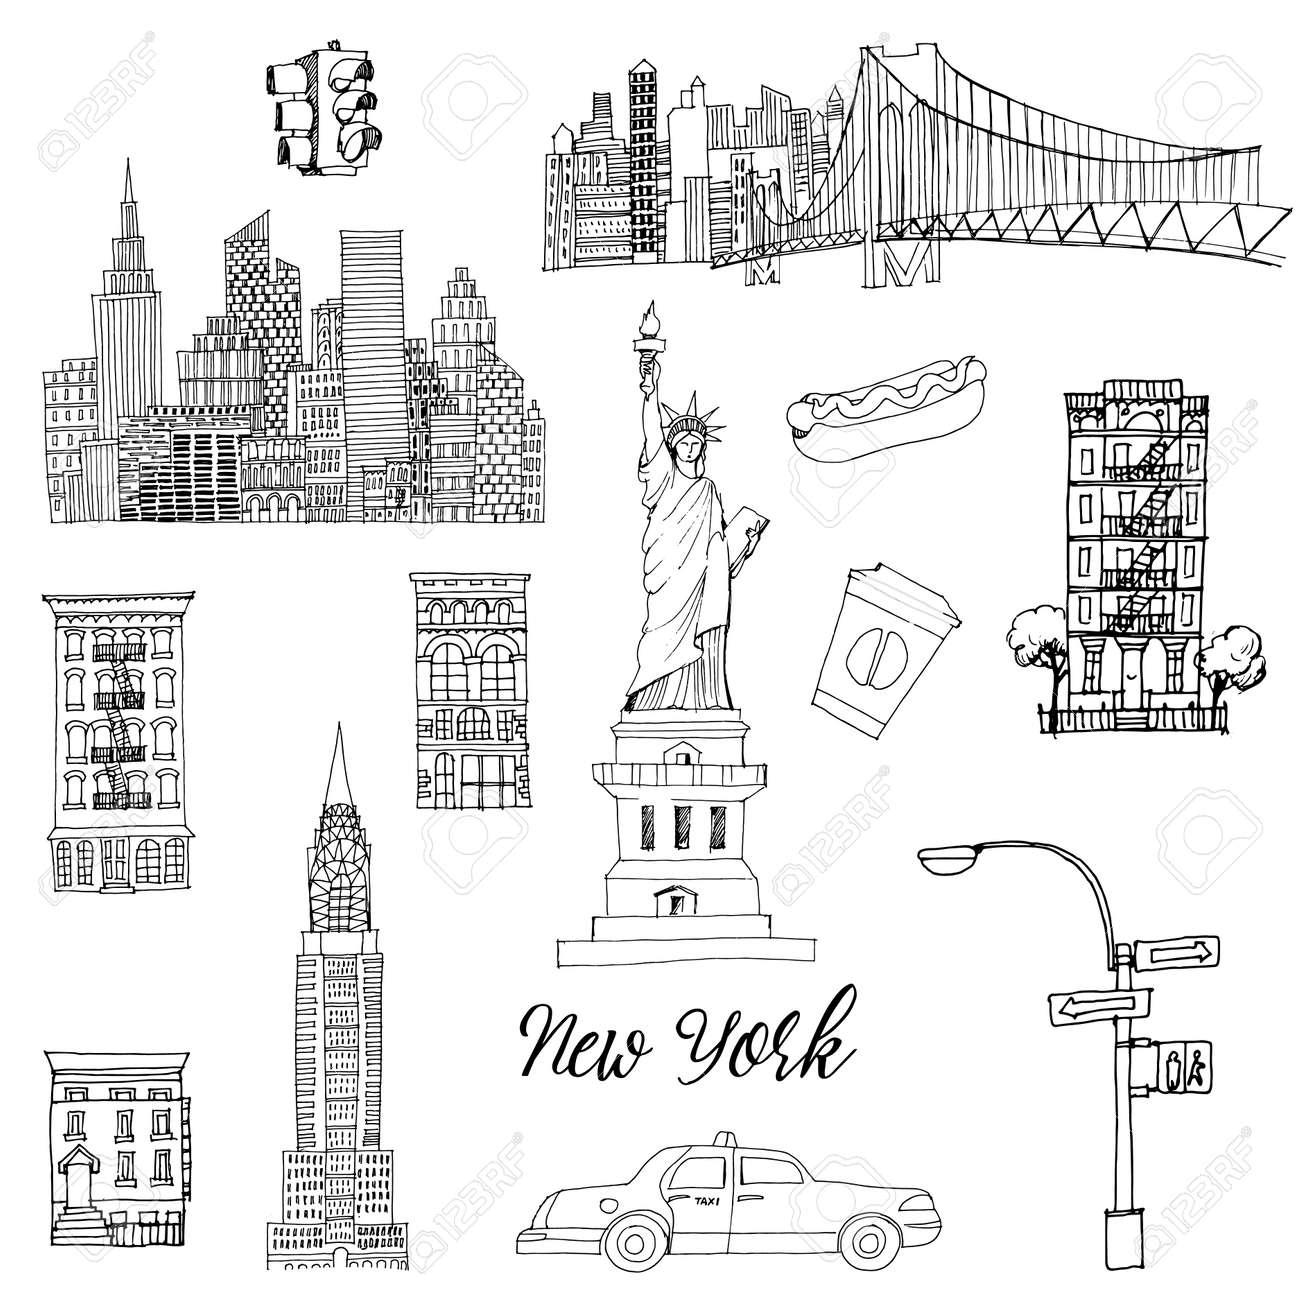 New York setr. Vector sketch - 159570312